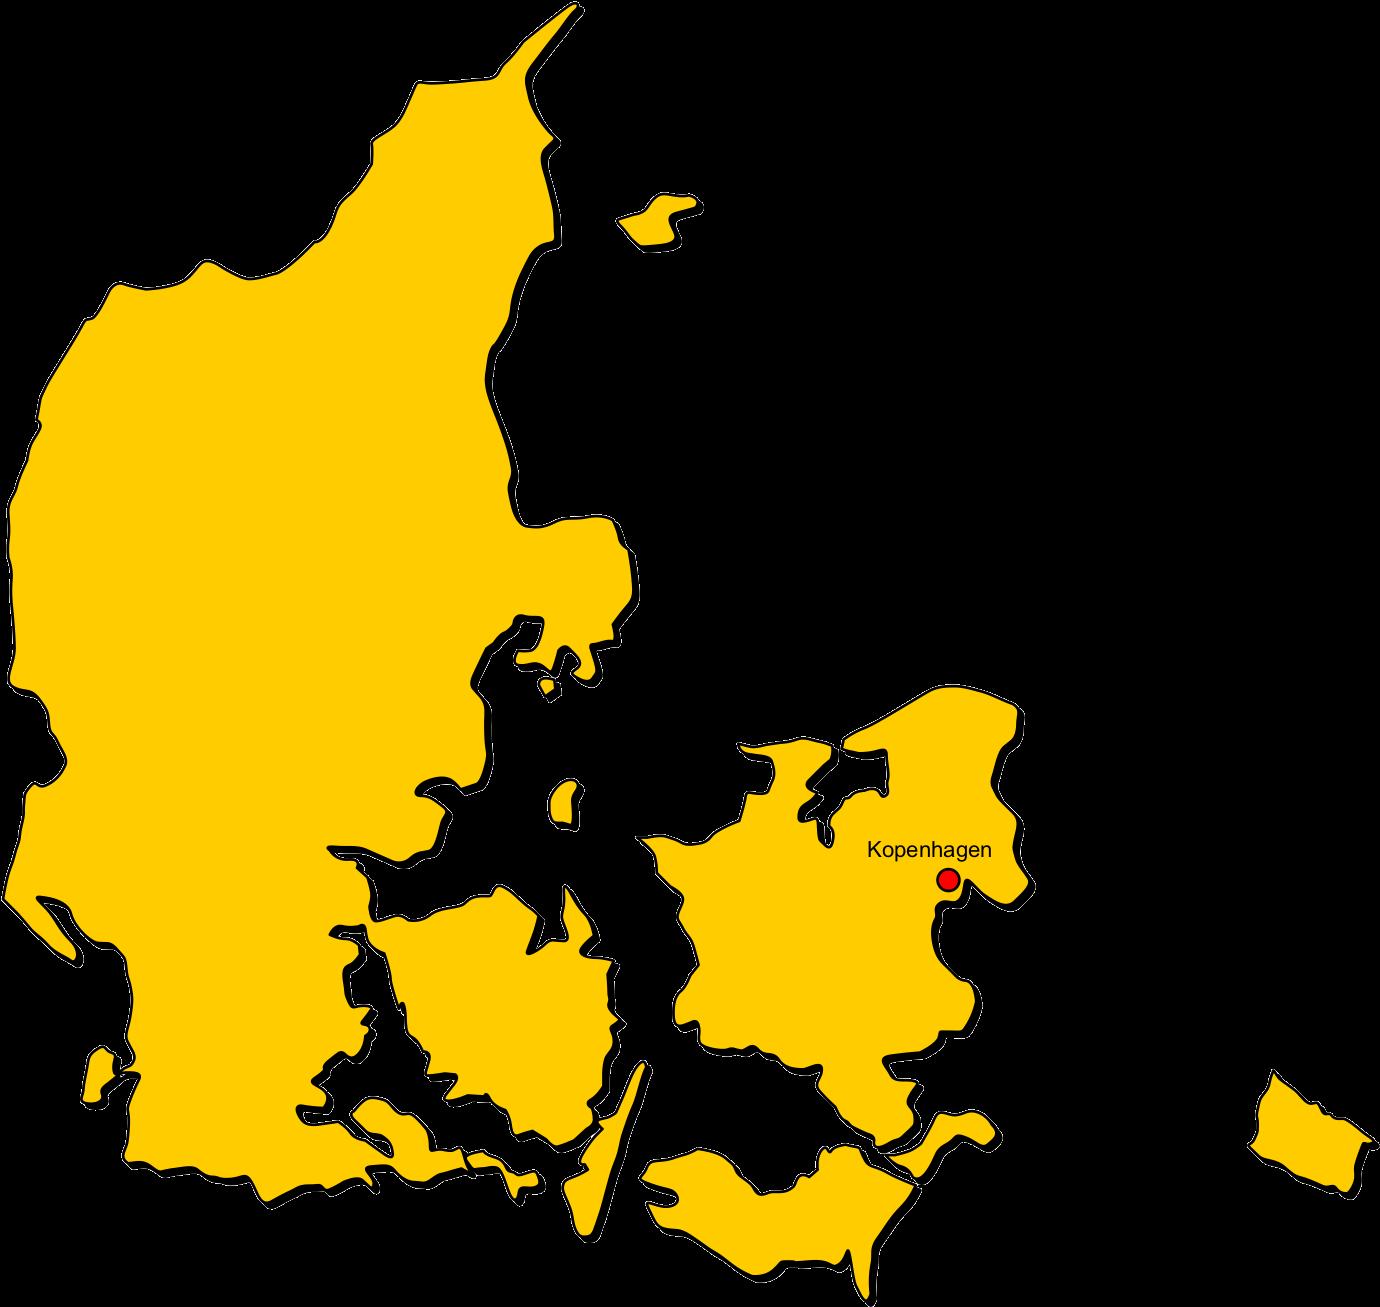 Karte clipart vector library download D U00e4nemark - Dänemark Karte Schwarz Weiß Clipart - Full ... vector library download